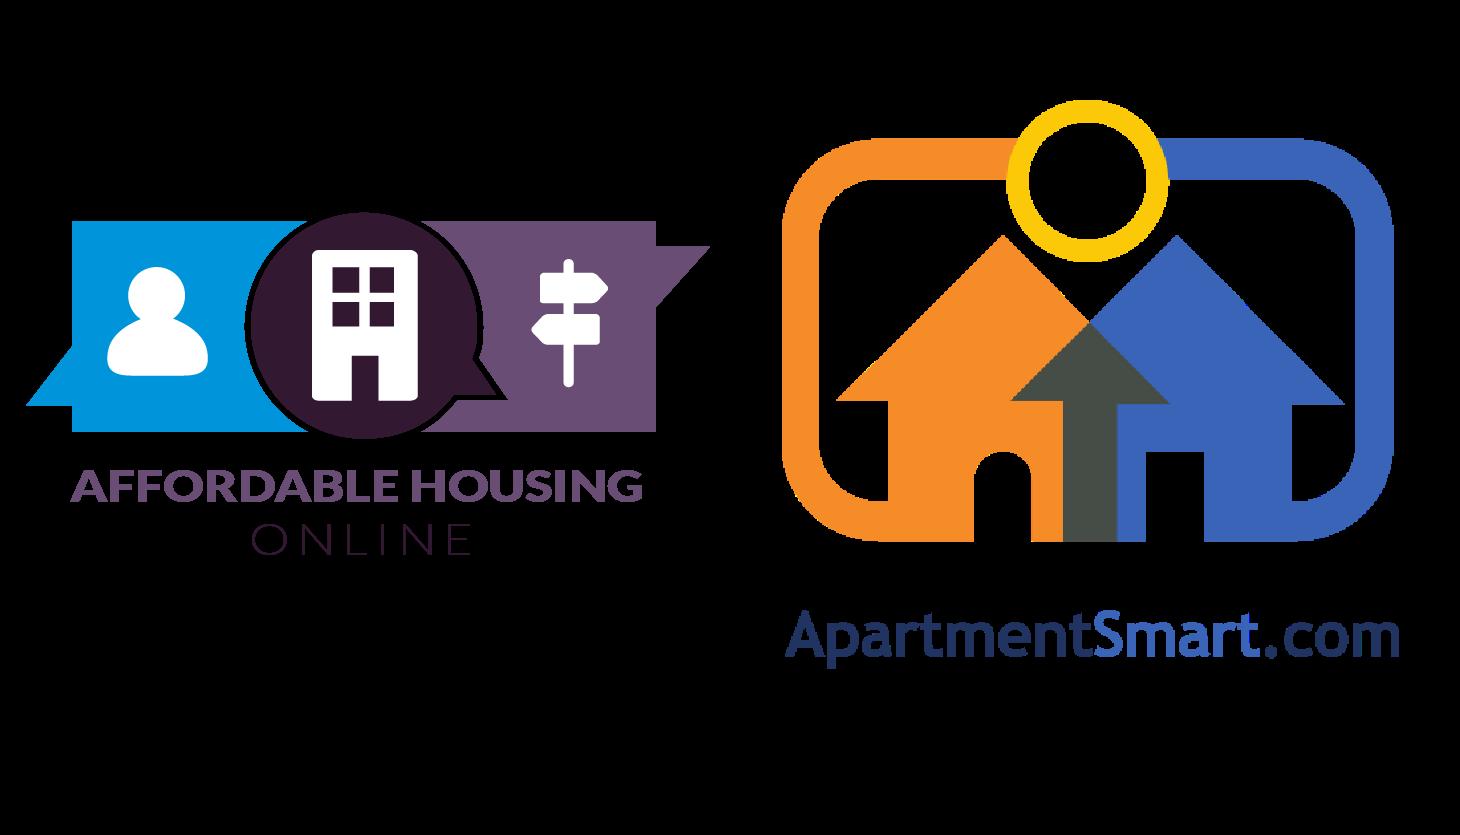 Tm associates rockville md - Apartmentsmart Com And Affordablehousingonline Com